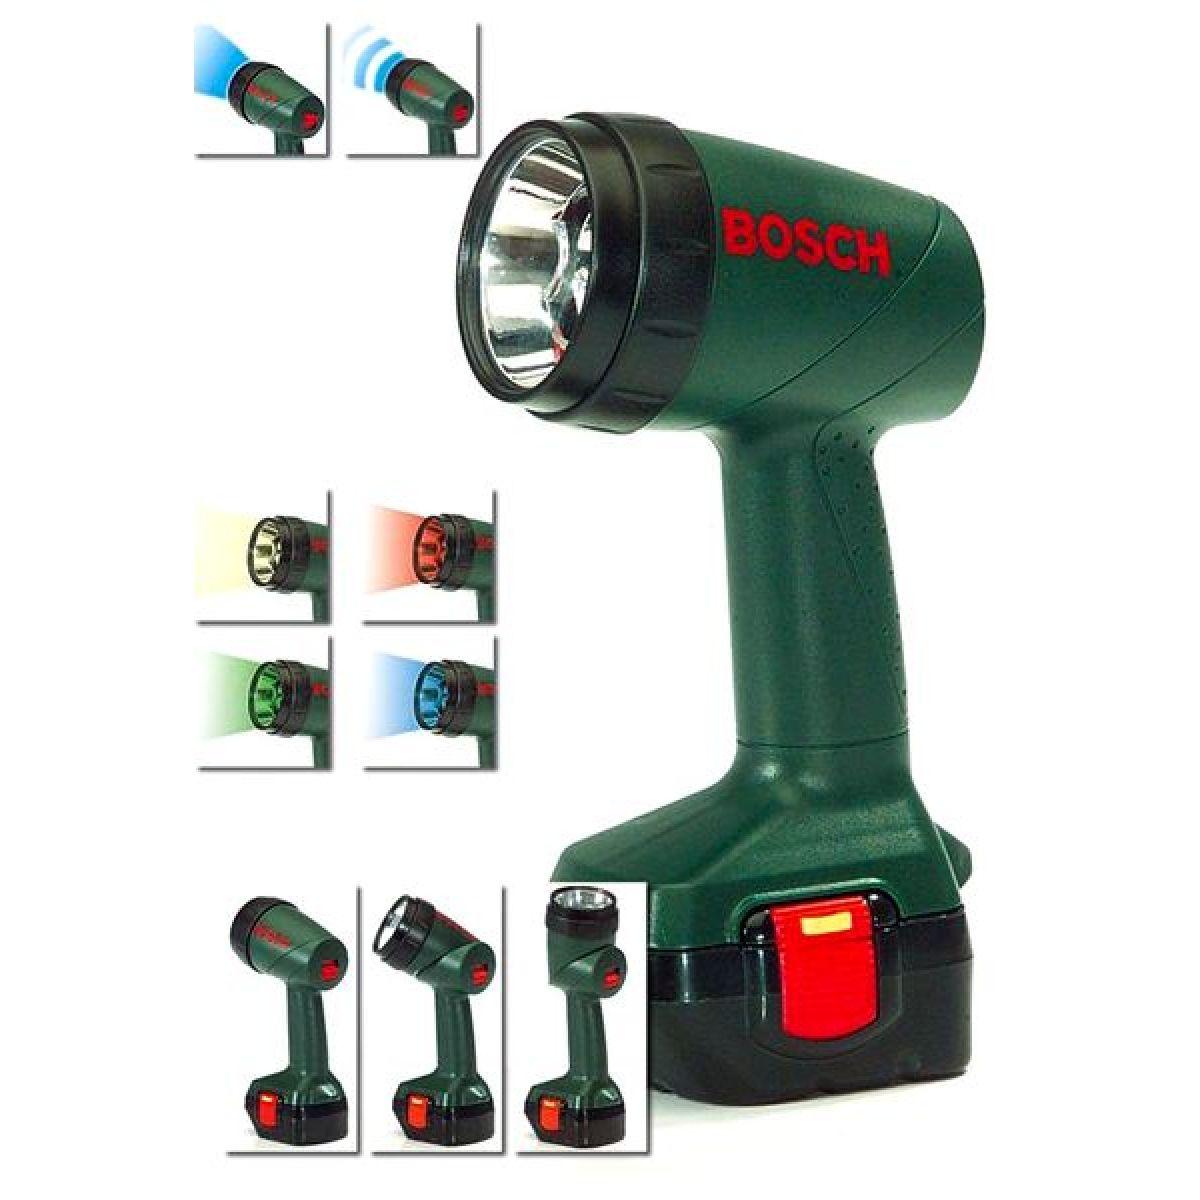 Klein 8448 - Bosch svítilna